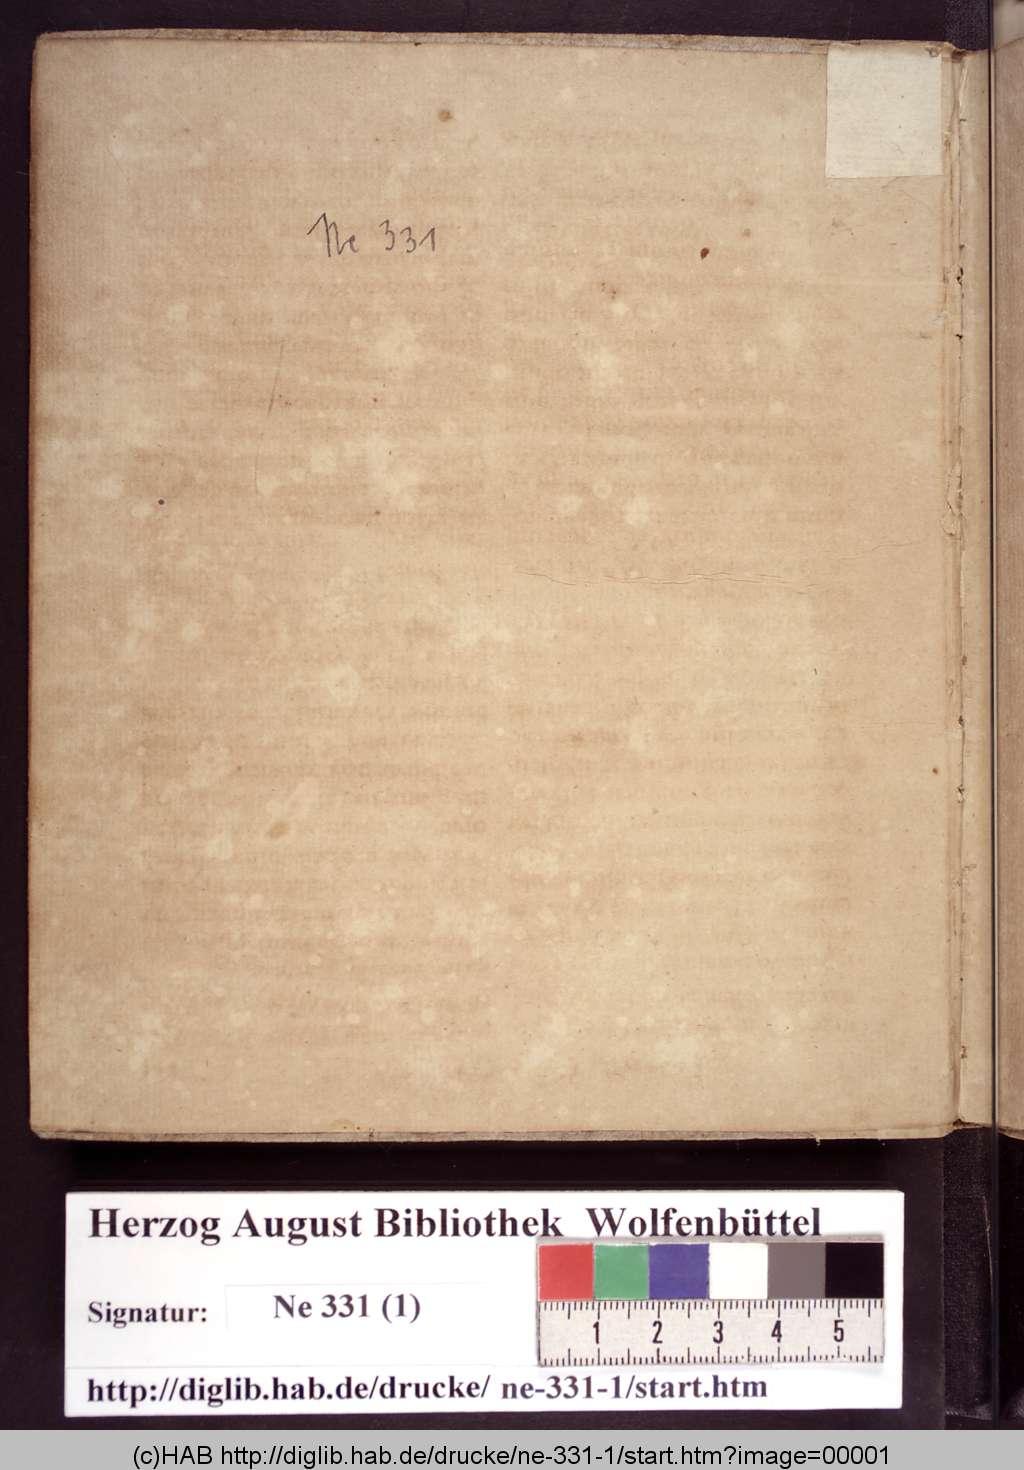 http://diglib.hab.de/drucke/ne-331-1/00001.jpg